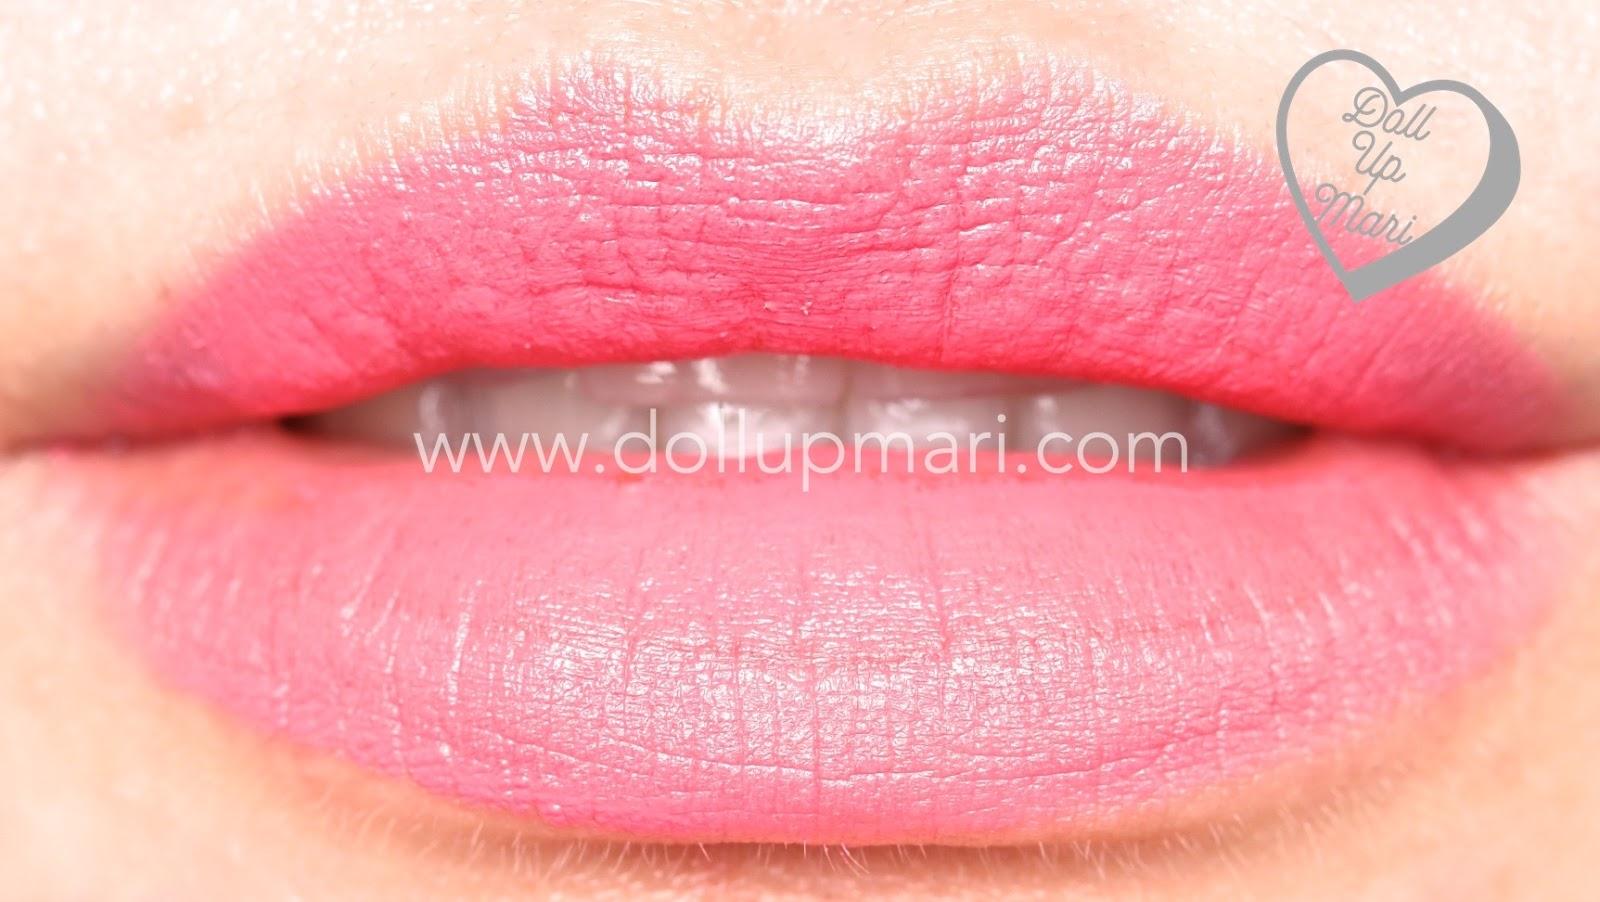 lip swatch Rose Awakening shade of AVON Perfectly Matte Lipstick